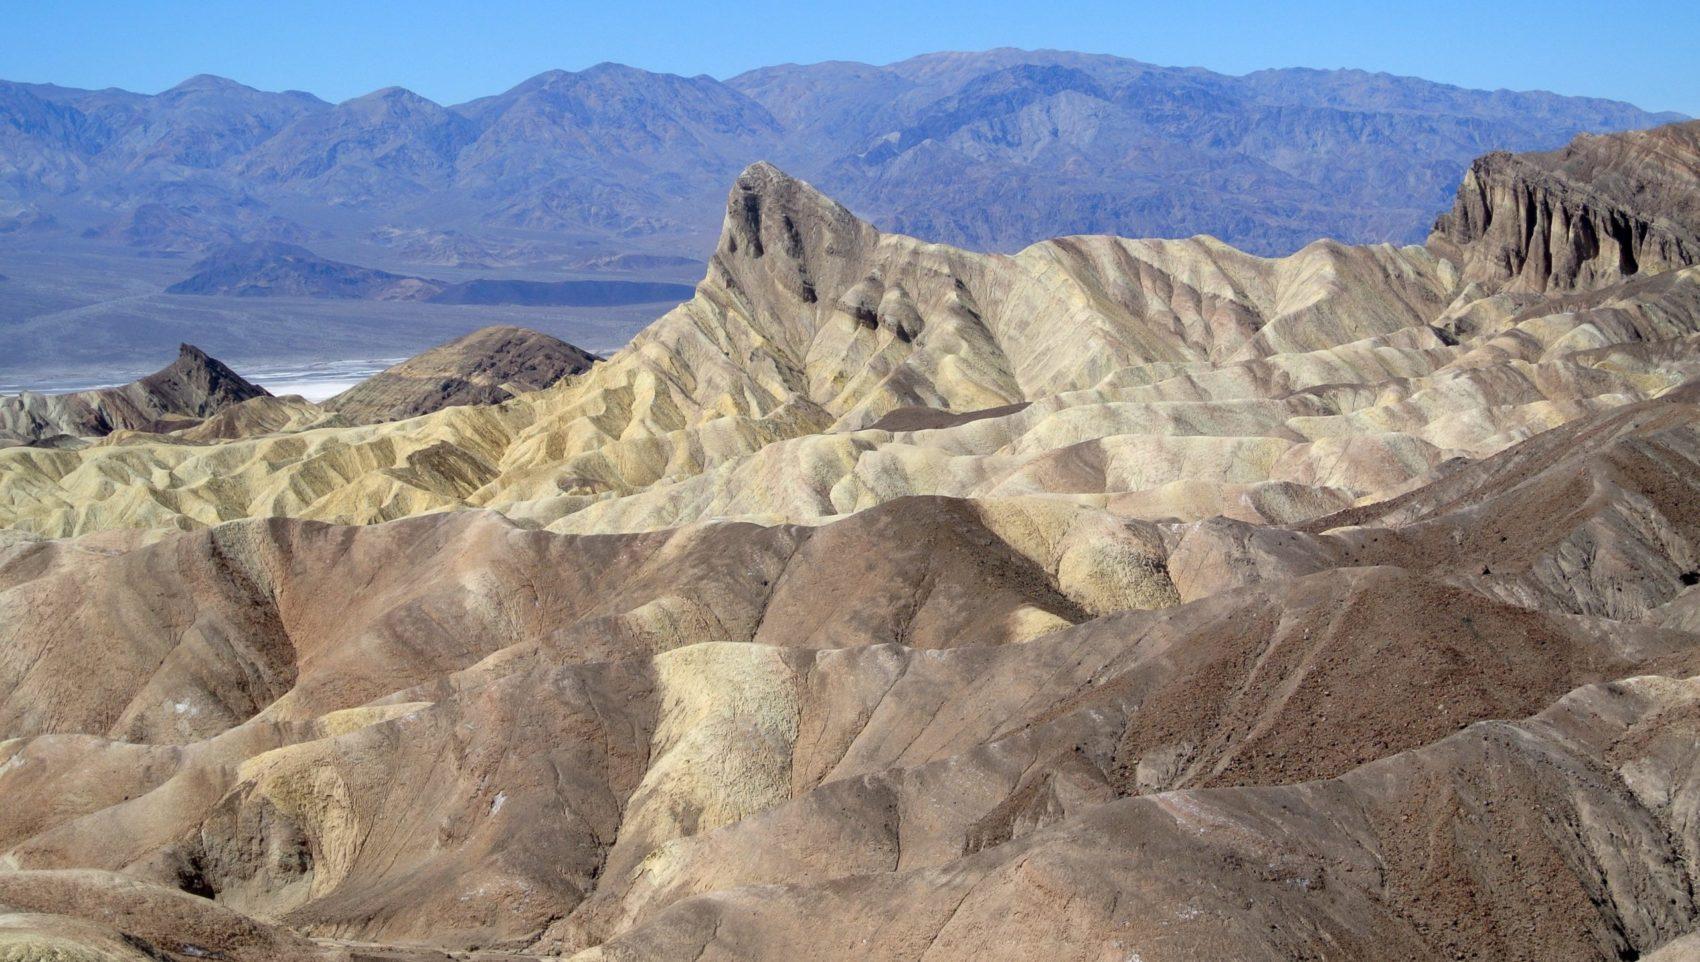 manly beacon, Death Valley, California